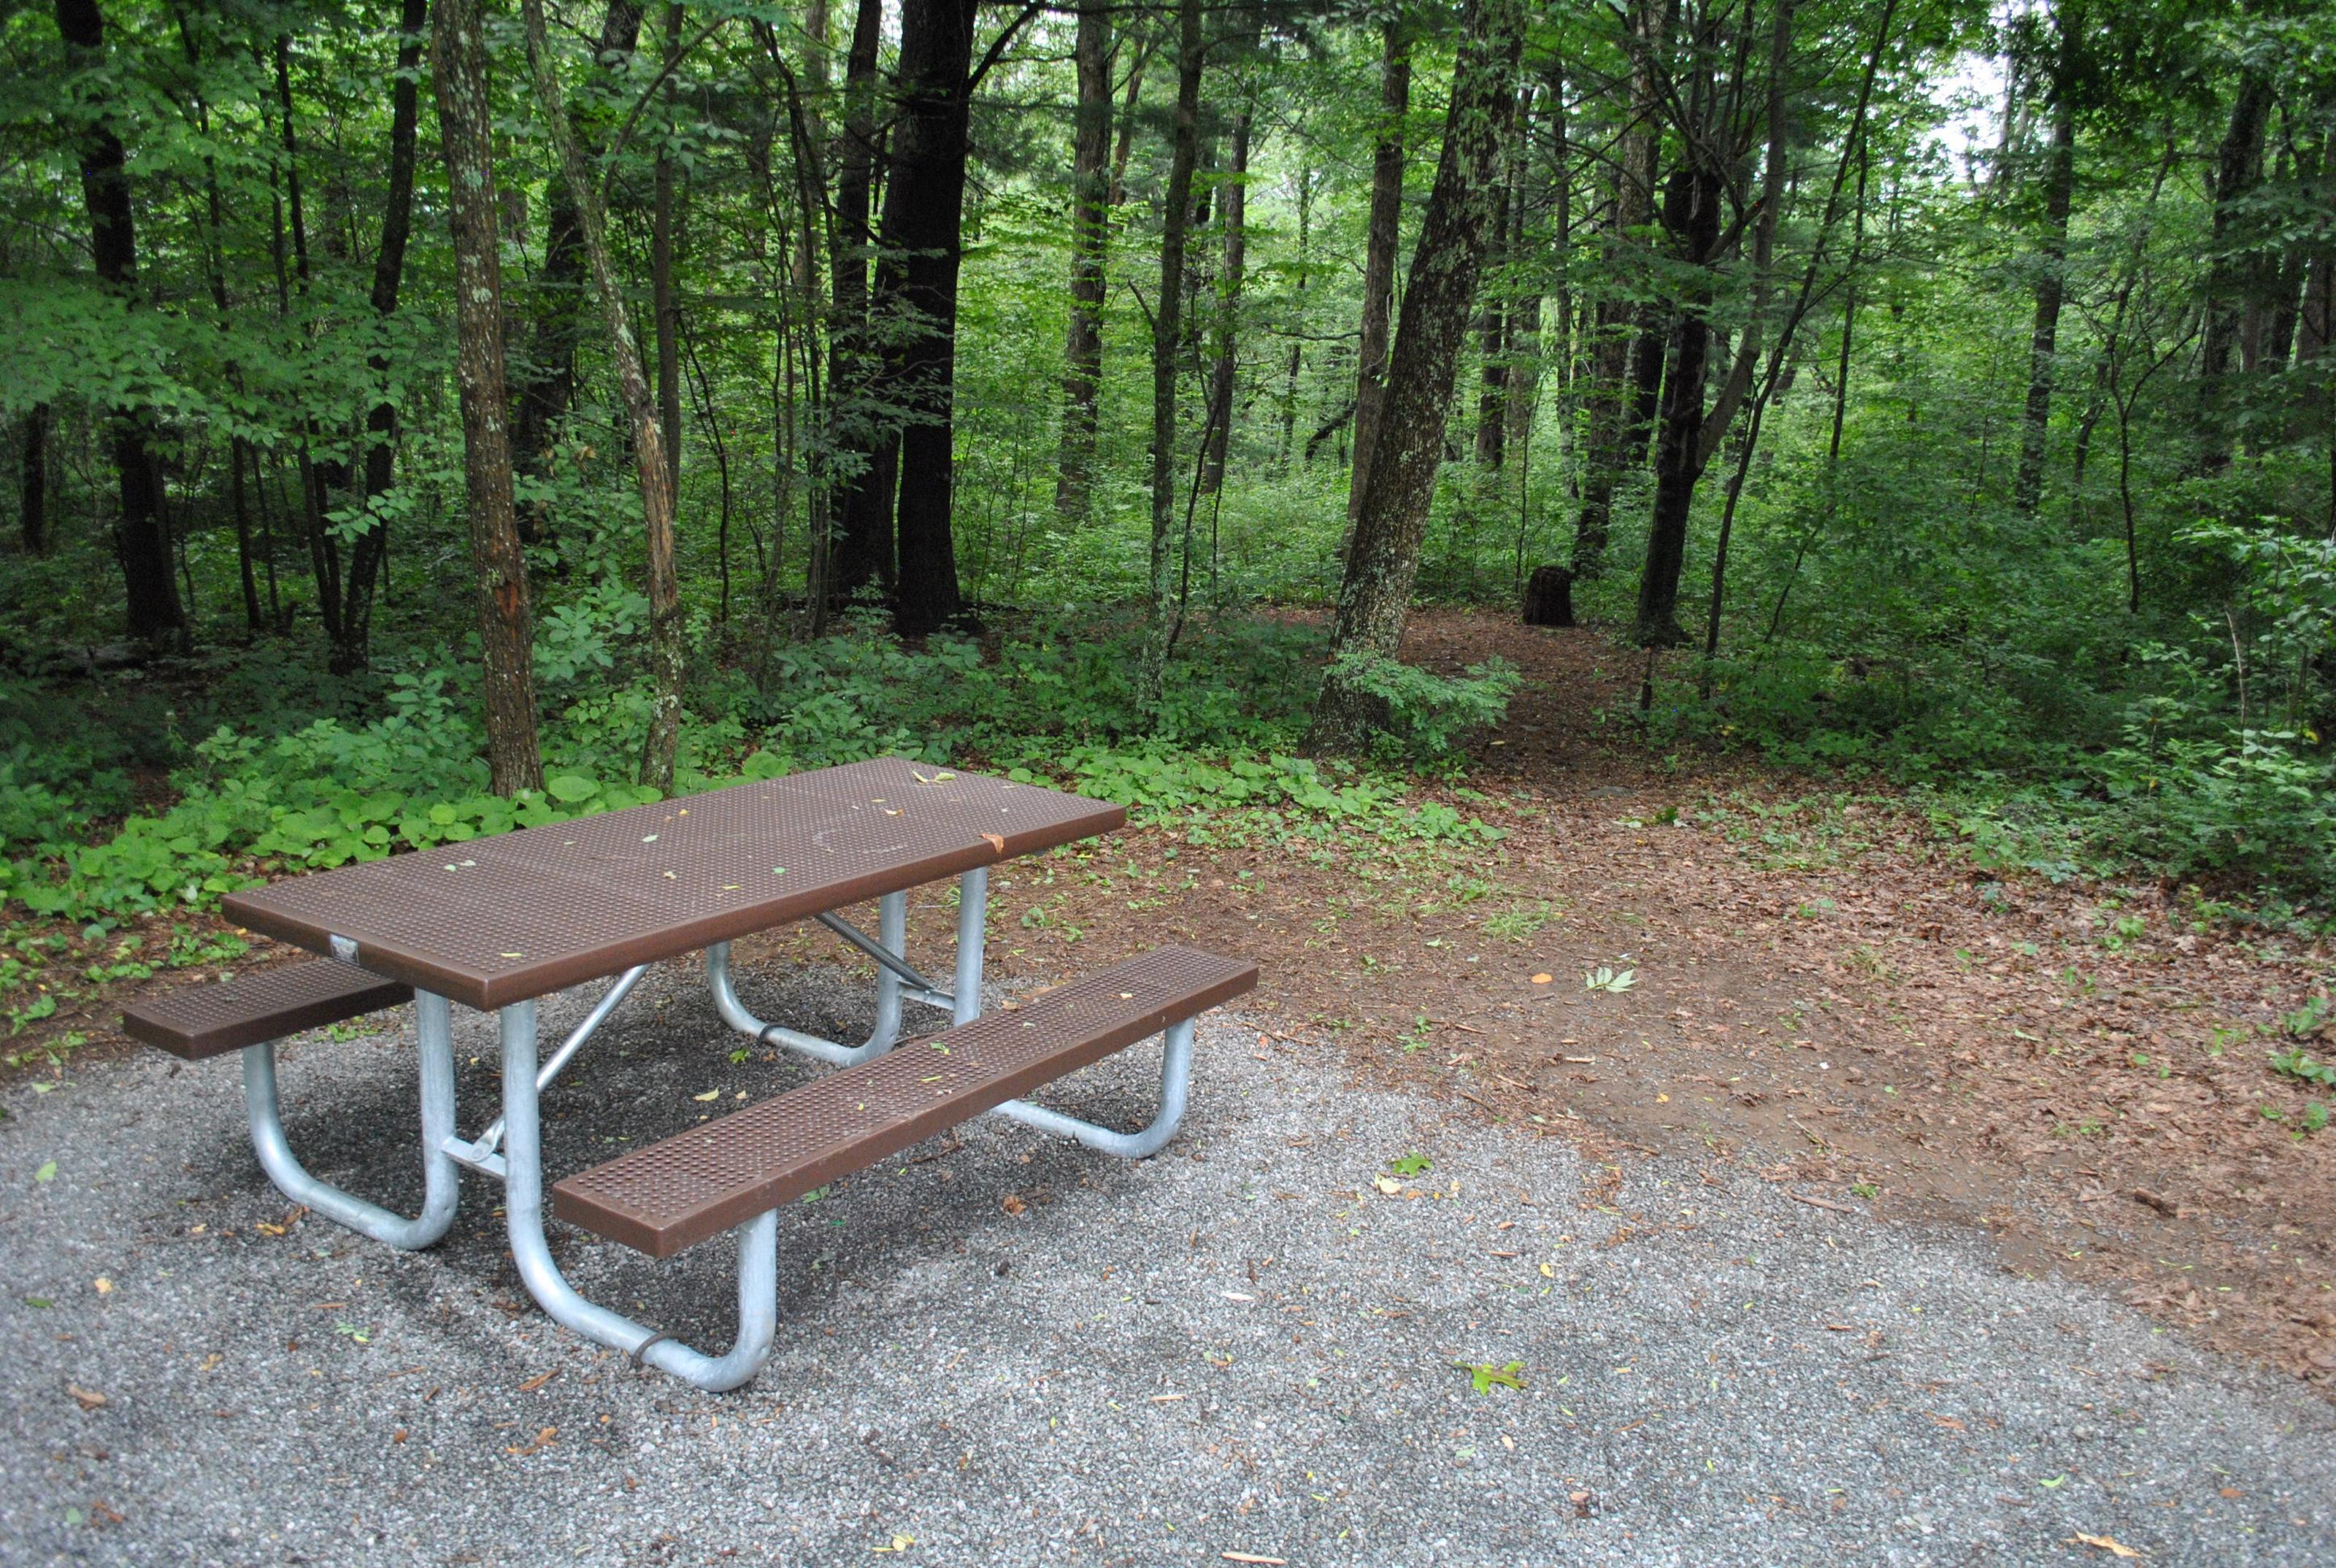 Mathews Arm Campground – Site A110 (Tent Pad)